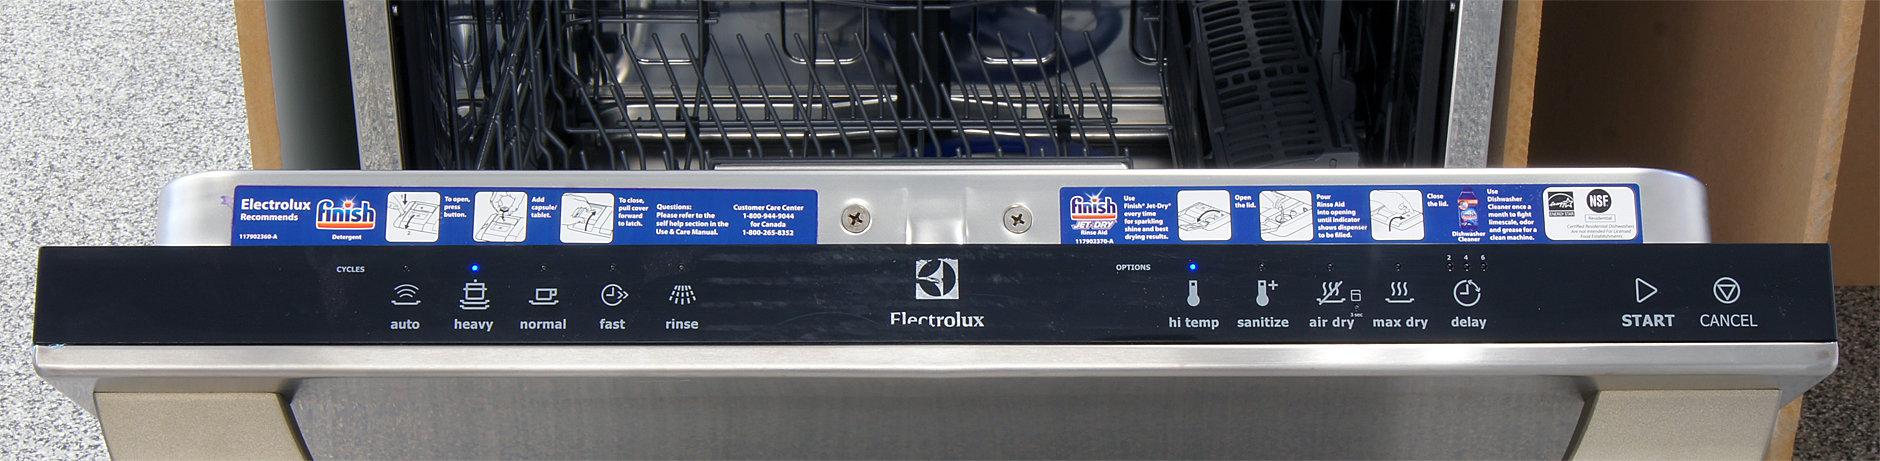 Electrolux EI24ID30QS control panel